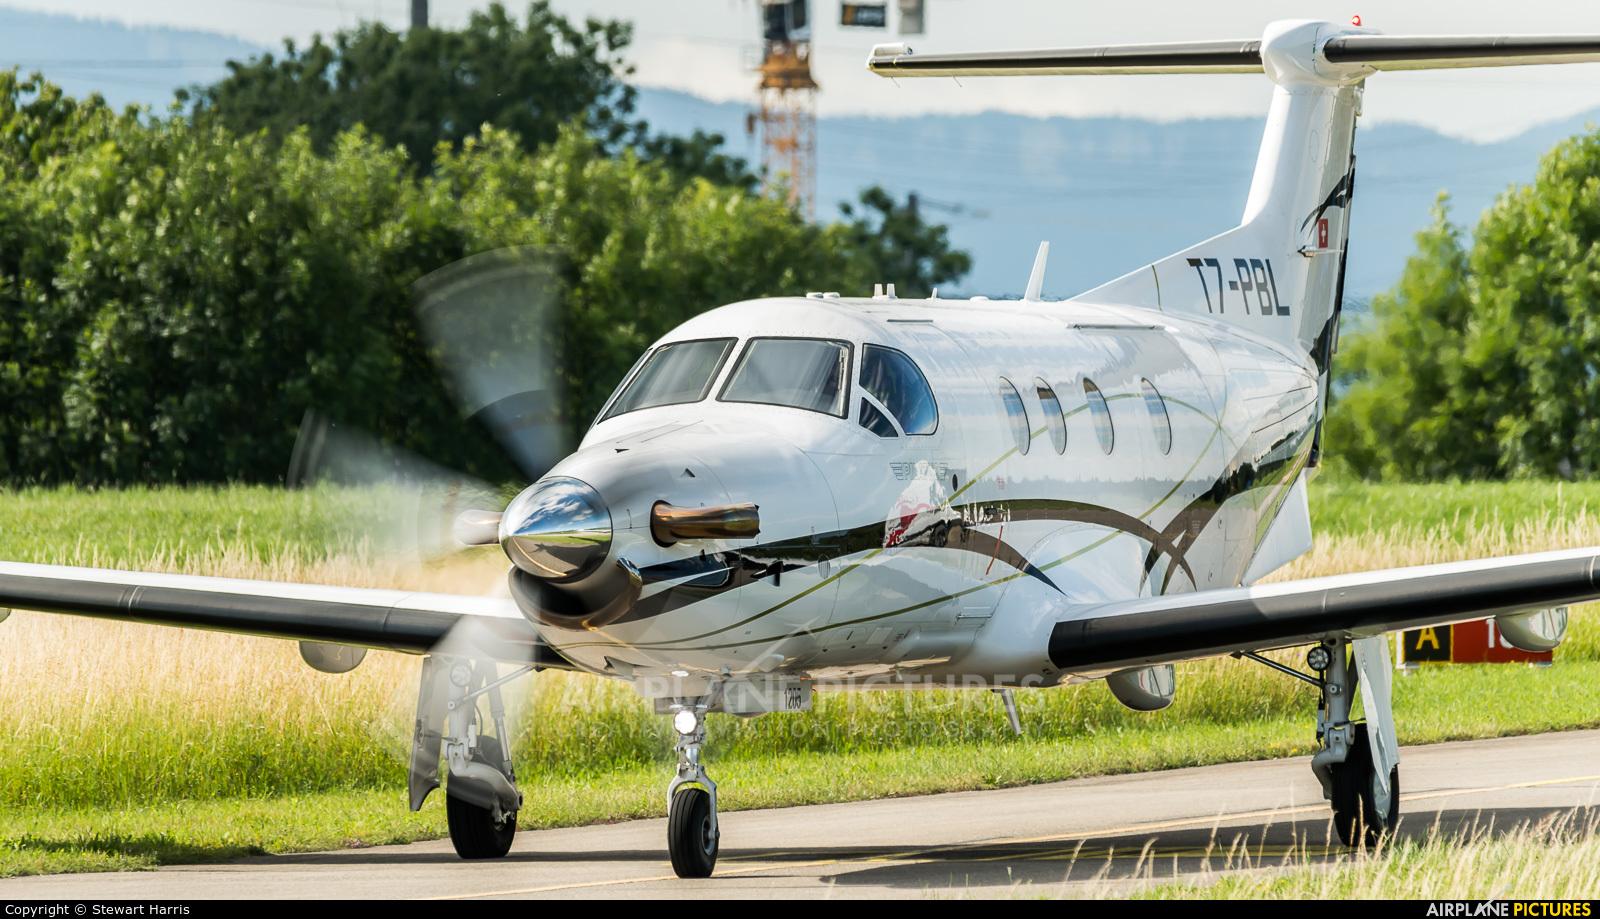 FLY 7 Executive Aviation SA T7-PBL aircraft at Lausanne - La Blécherette